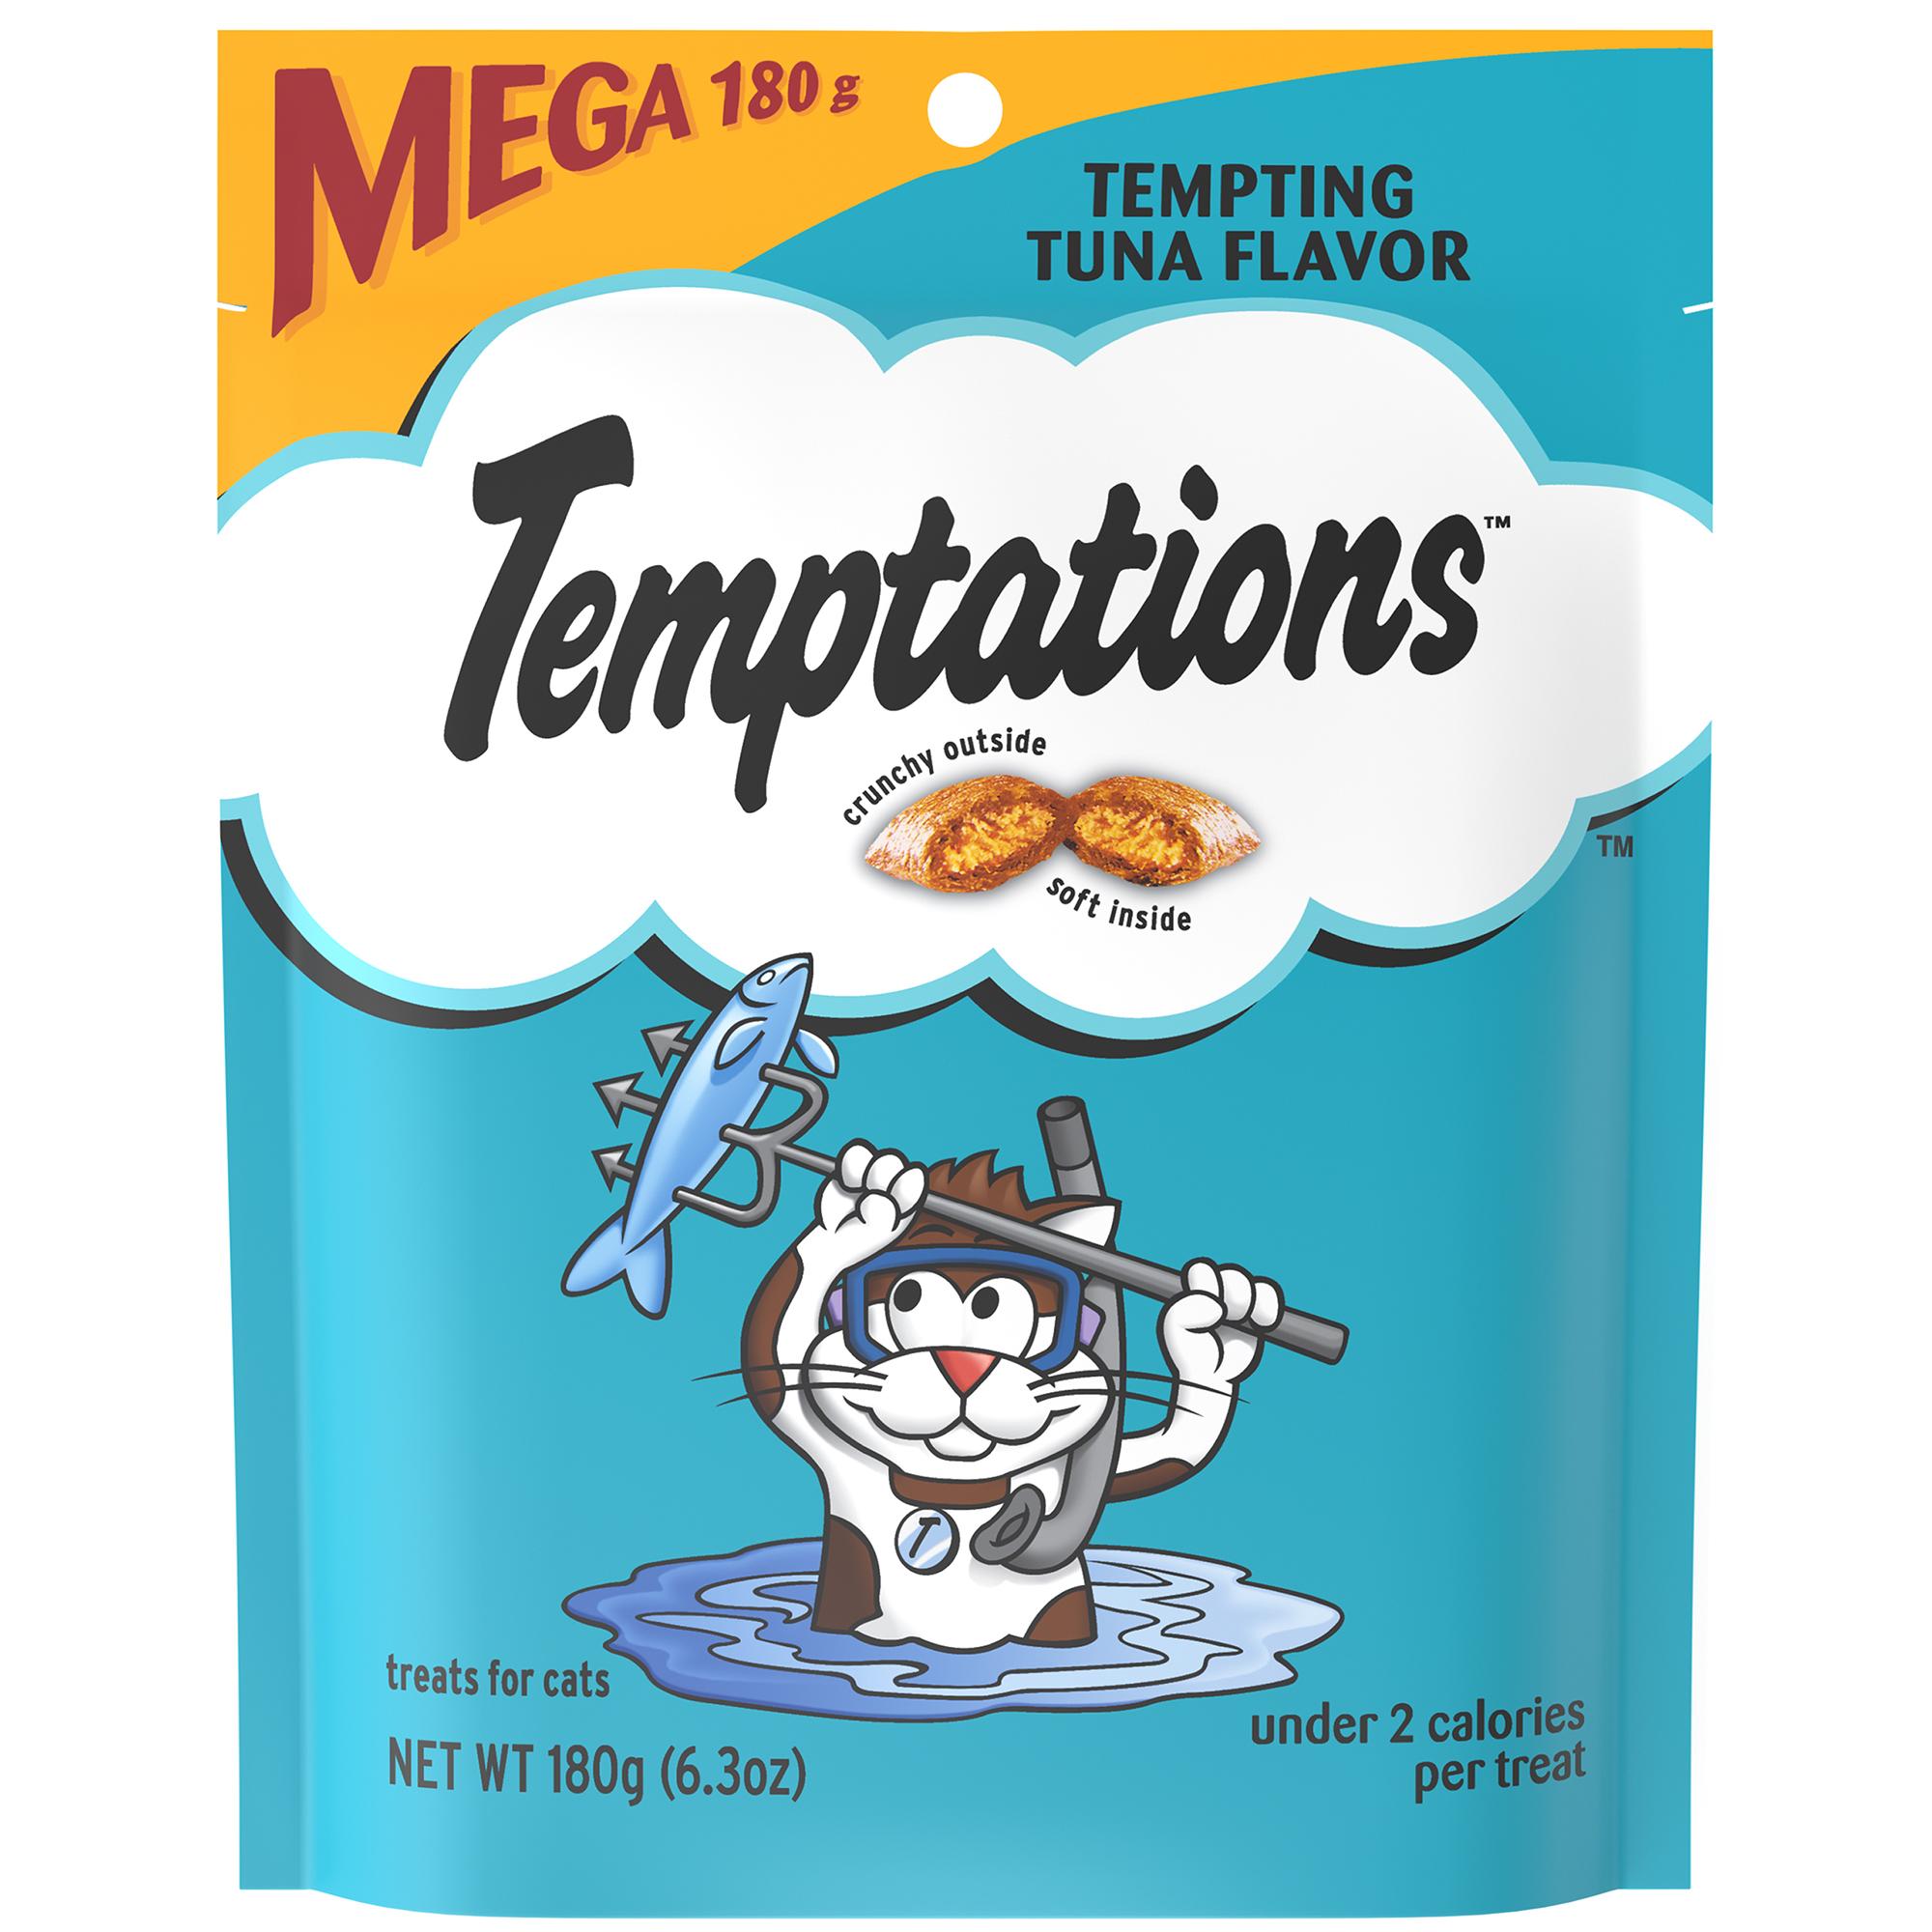 TEMPTATIONS Classic Treats for Cats Tempting Tuna Flavor, 6.3 oz. Pouch